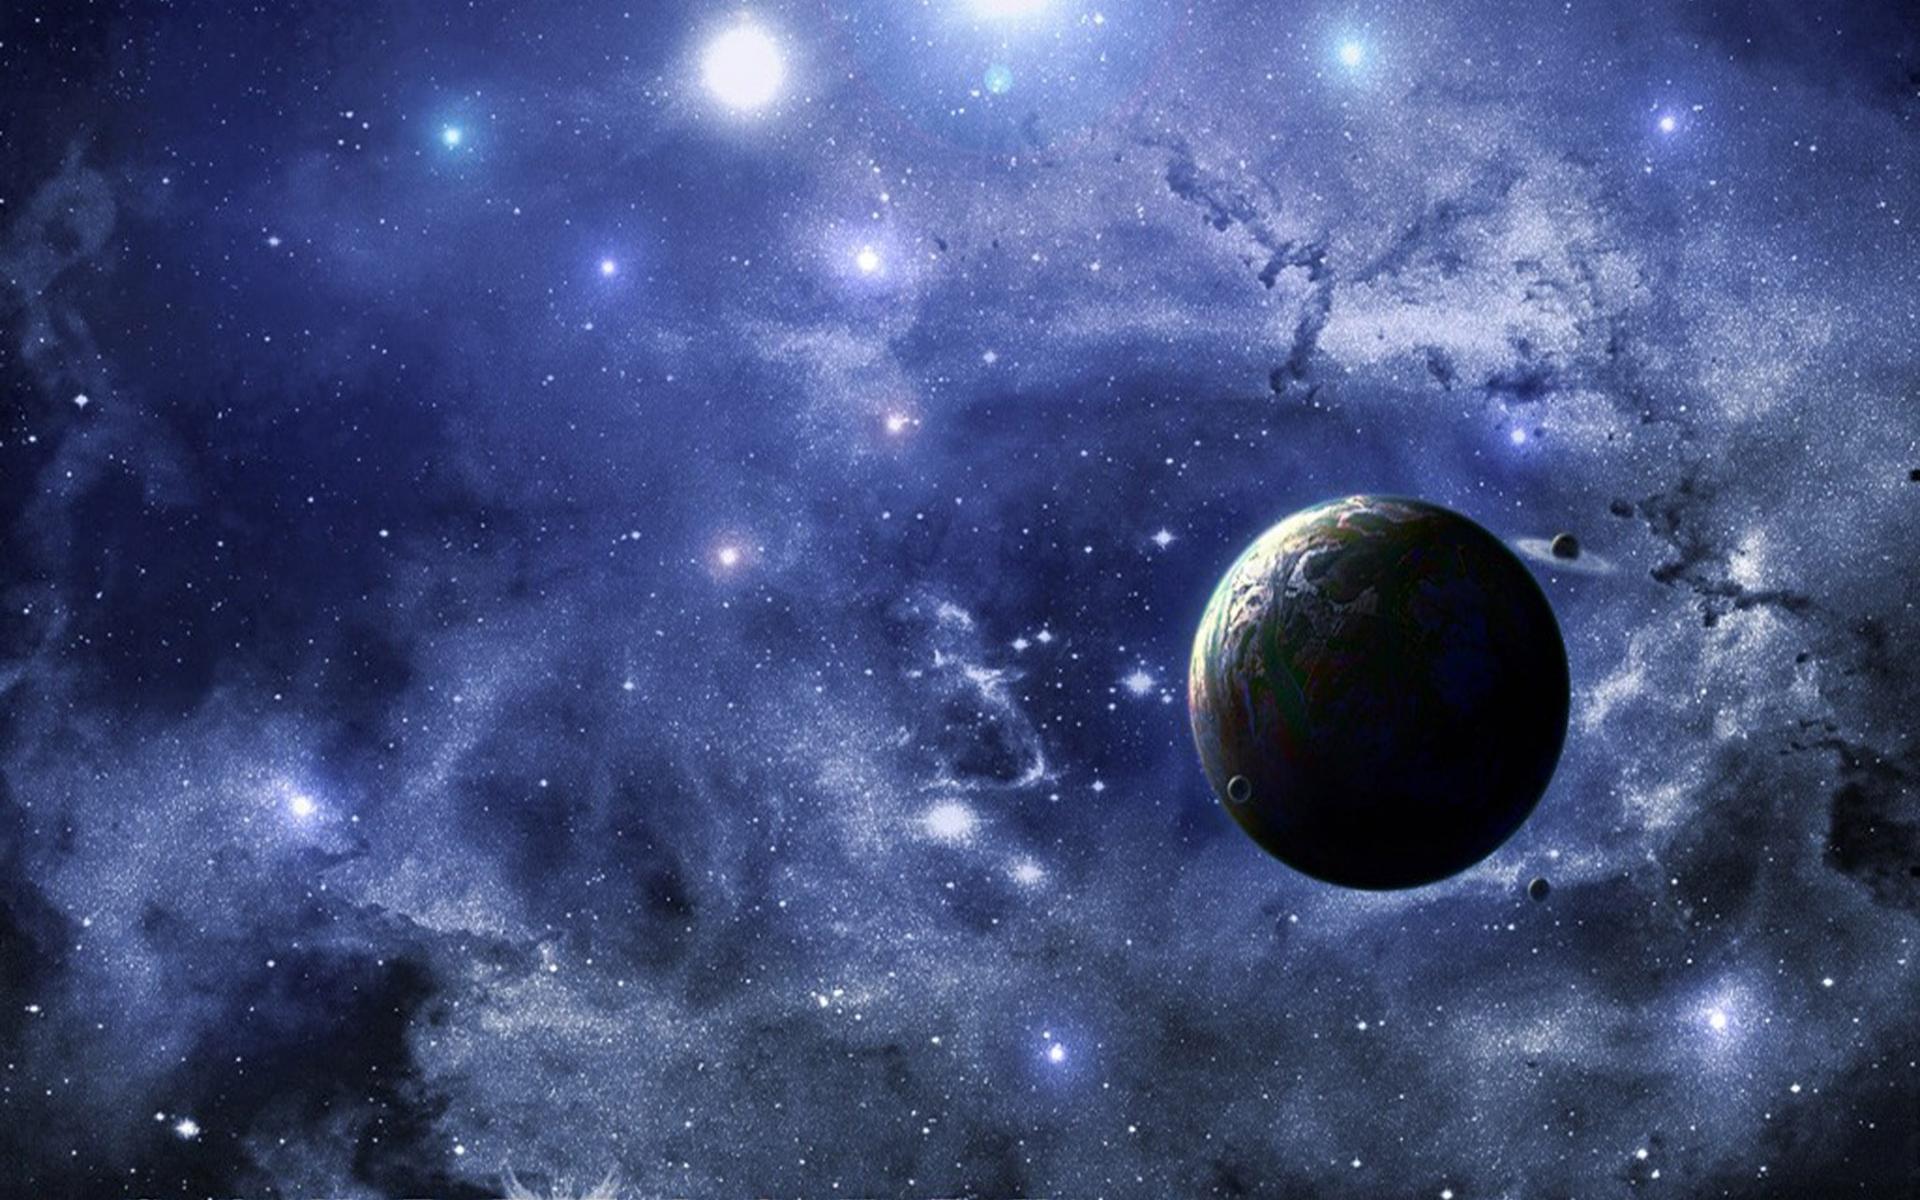 3d universe planets hd widescreen desktop wallpaper hd wallpapers